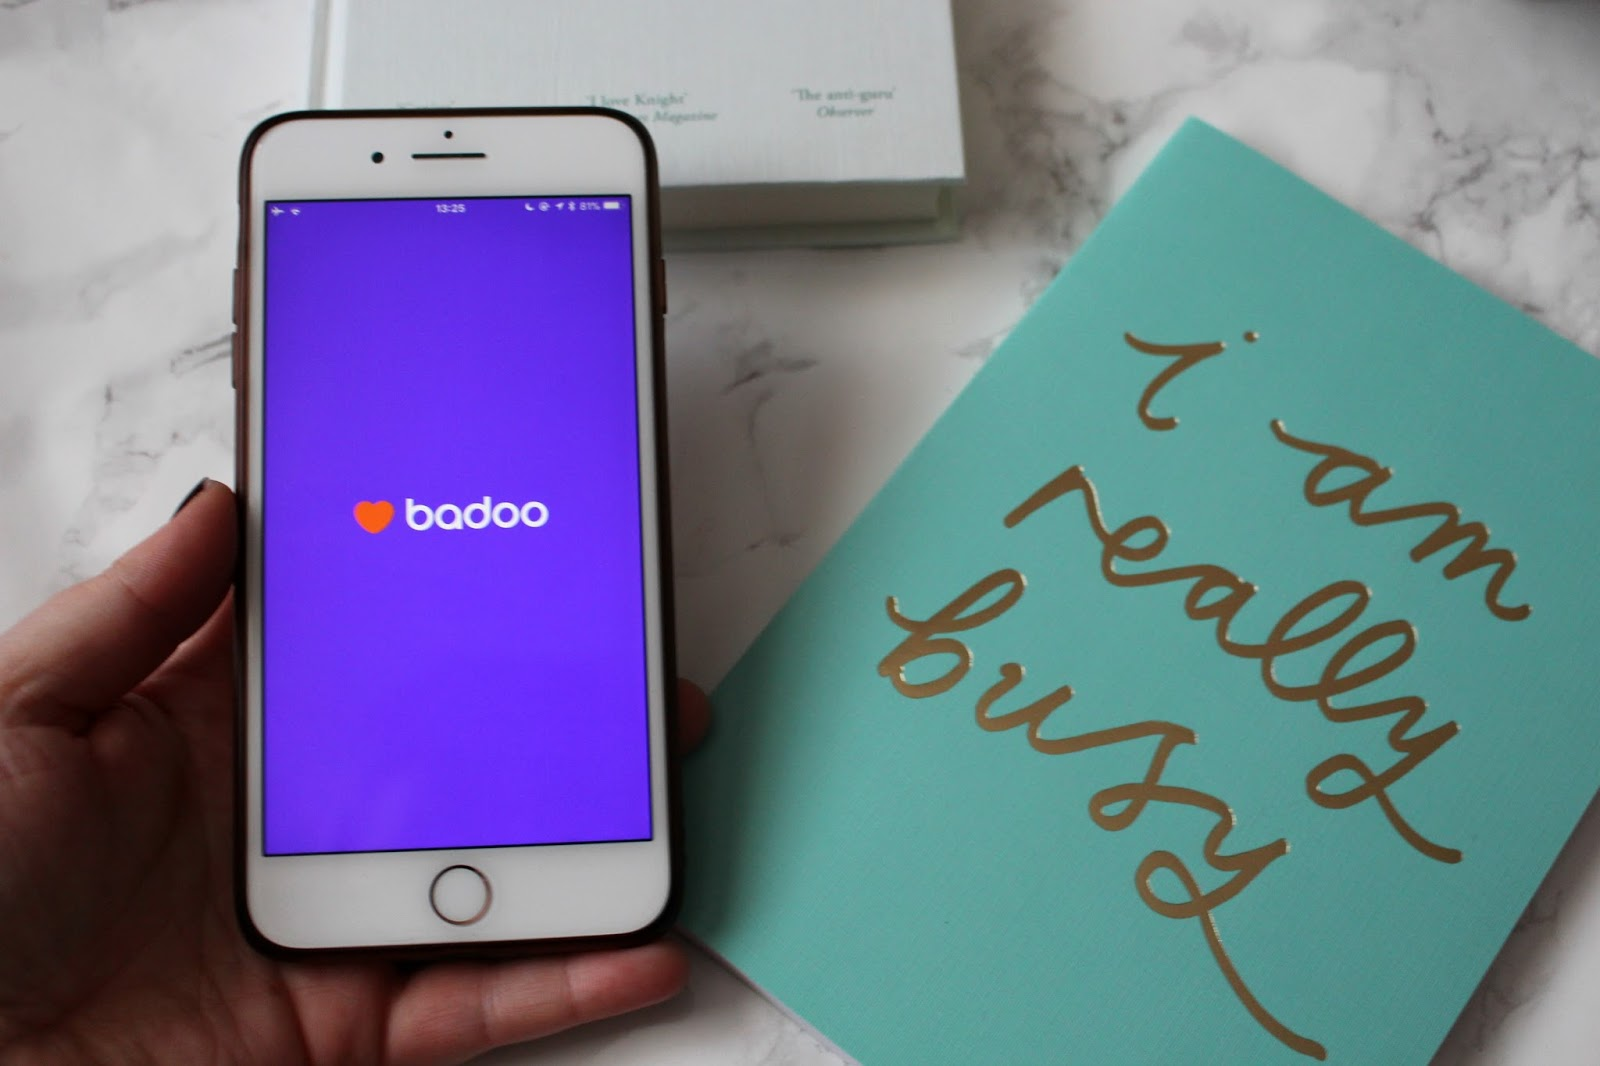 badoo dating game